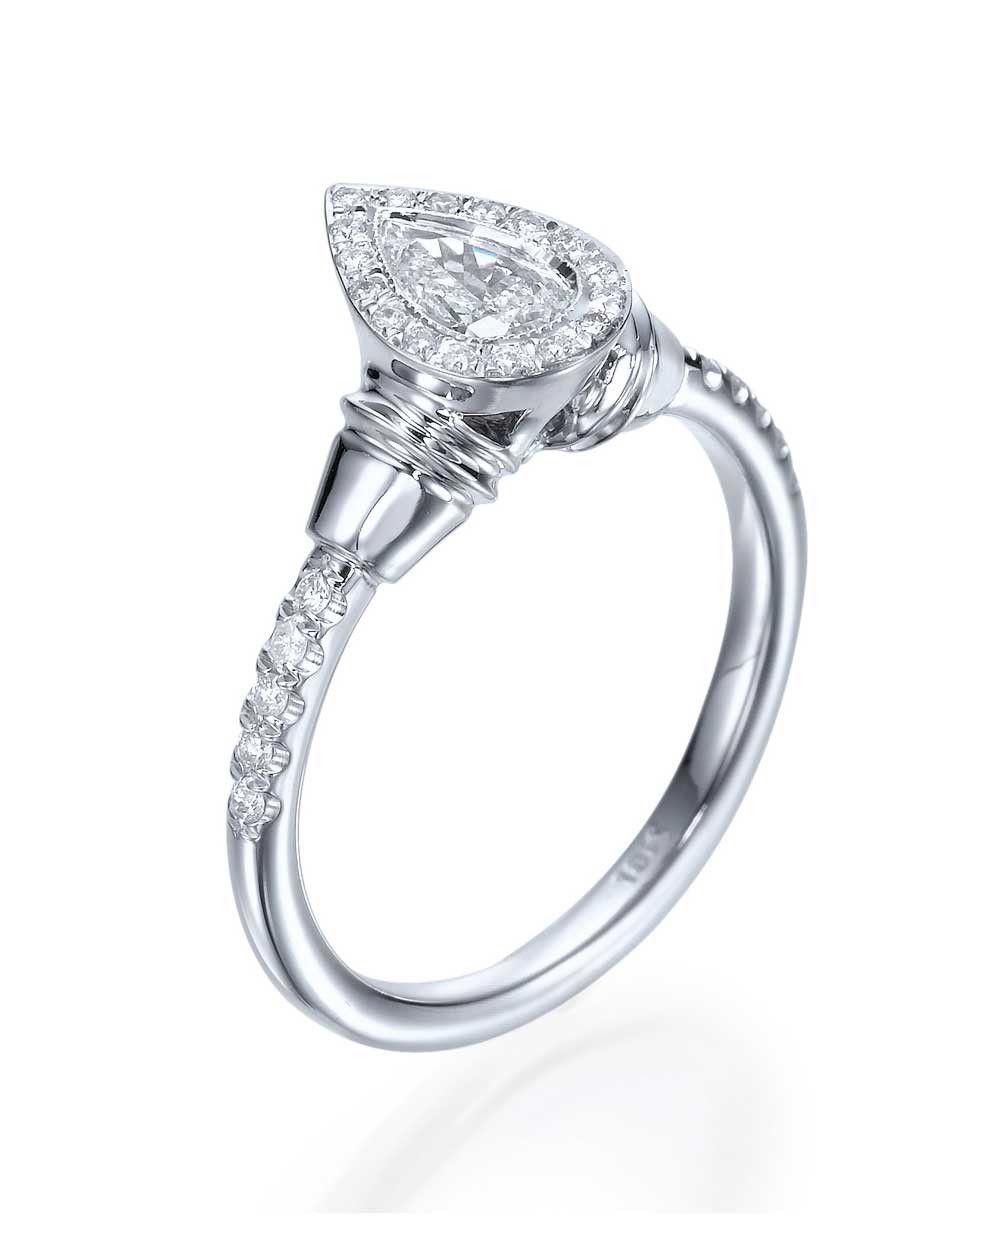 Halo pear shaped diamond antique vintage engagement ring vintage